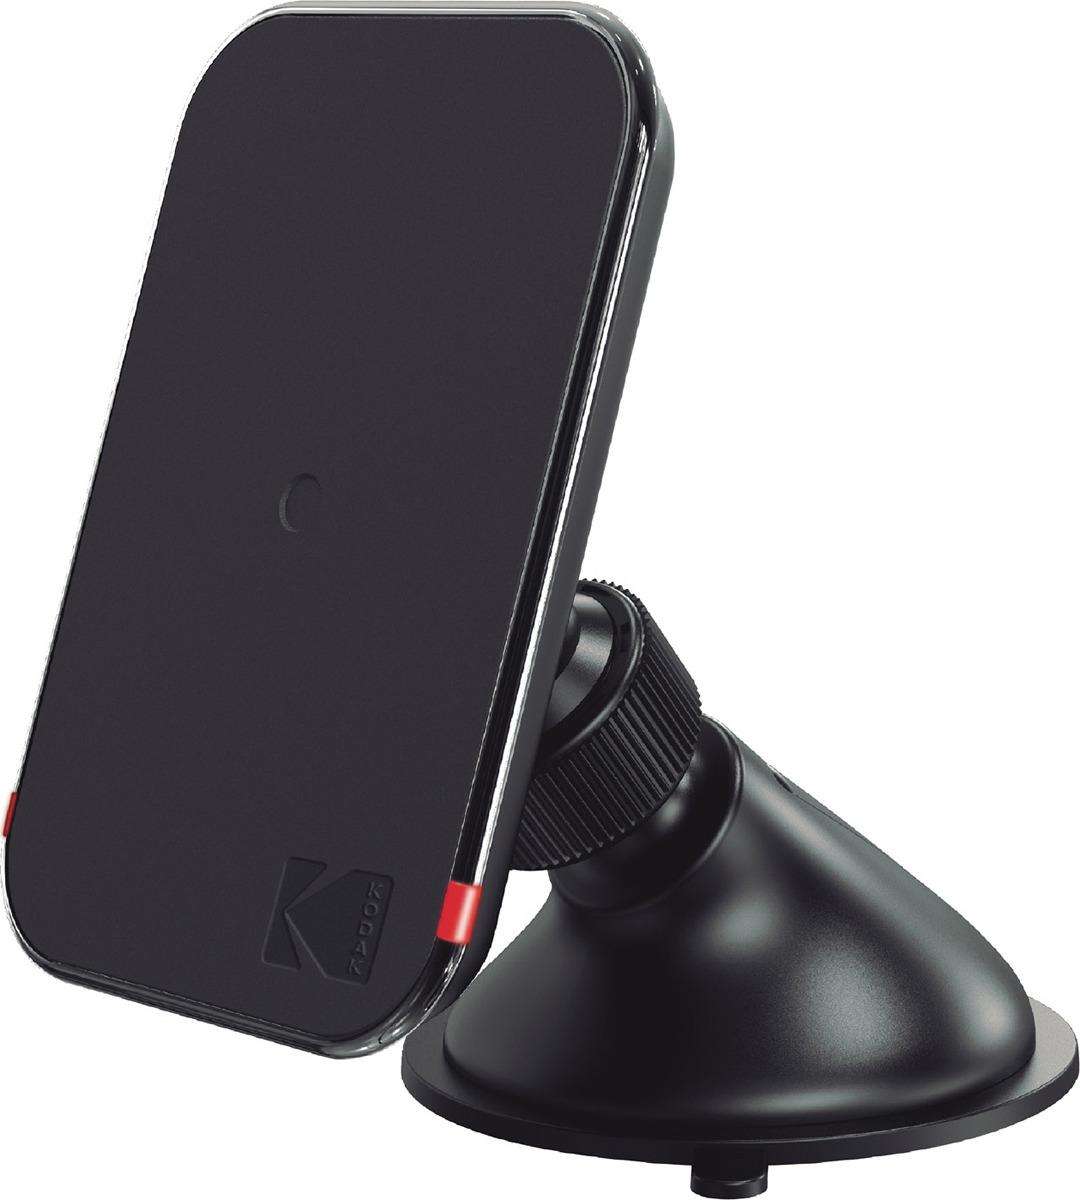 Фото - Автомобильное зарядное устройство Kodak, UC101, черный беспроводное автомобильное зарядное устройство черный